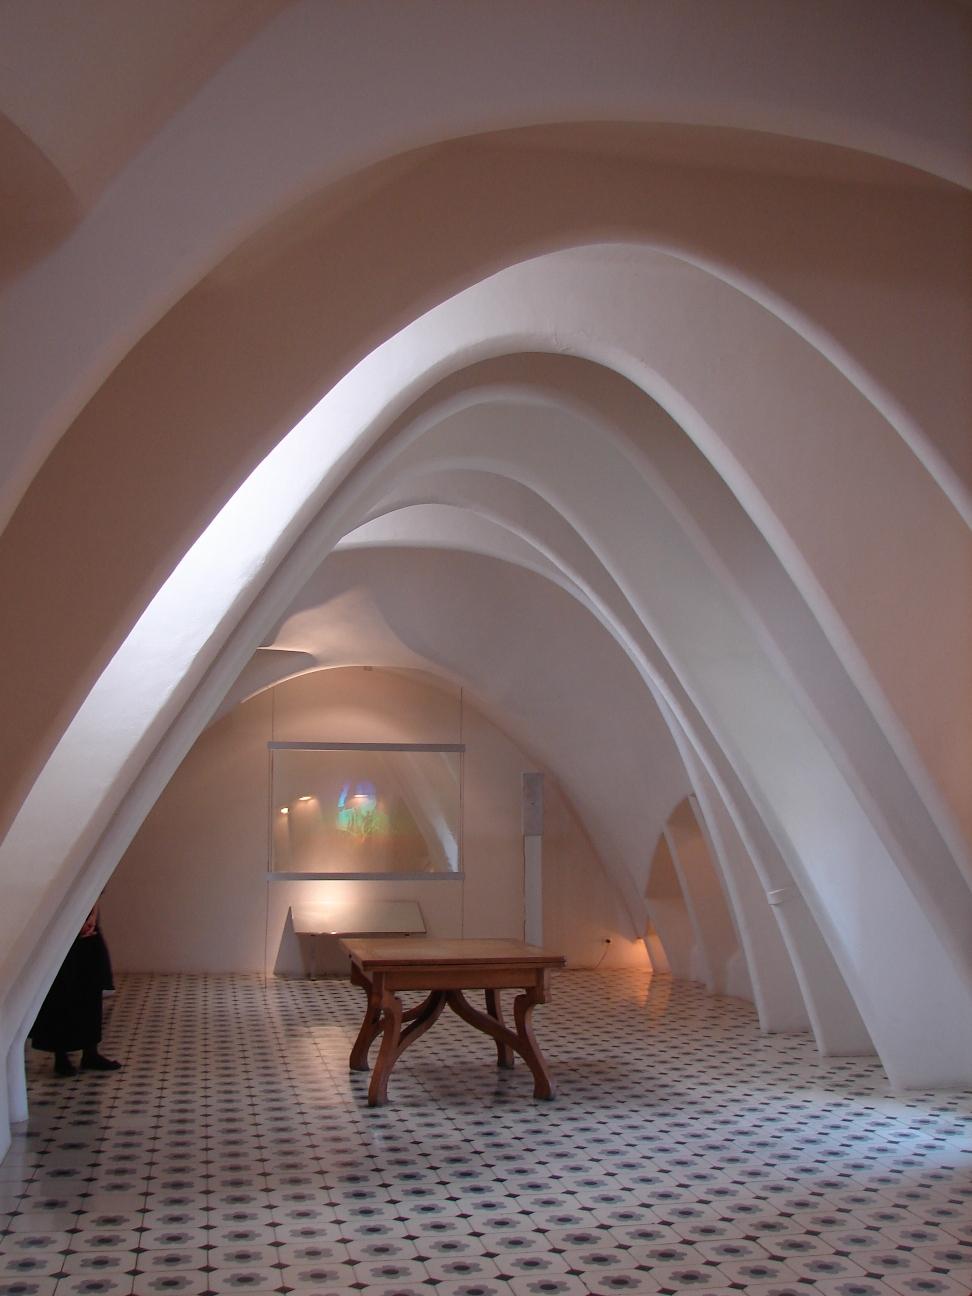 Casa Batlló - Arches 1